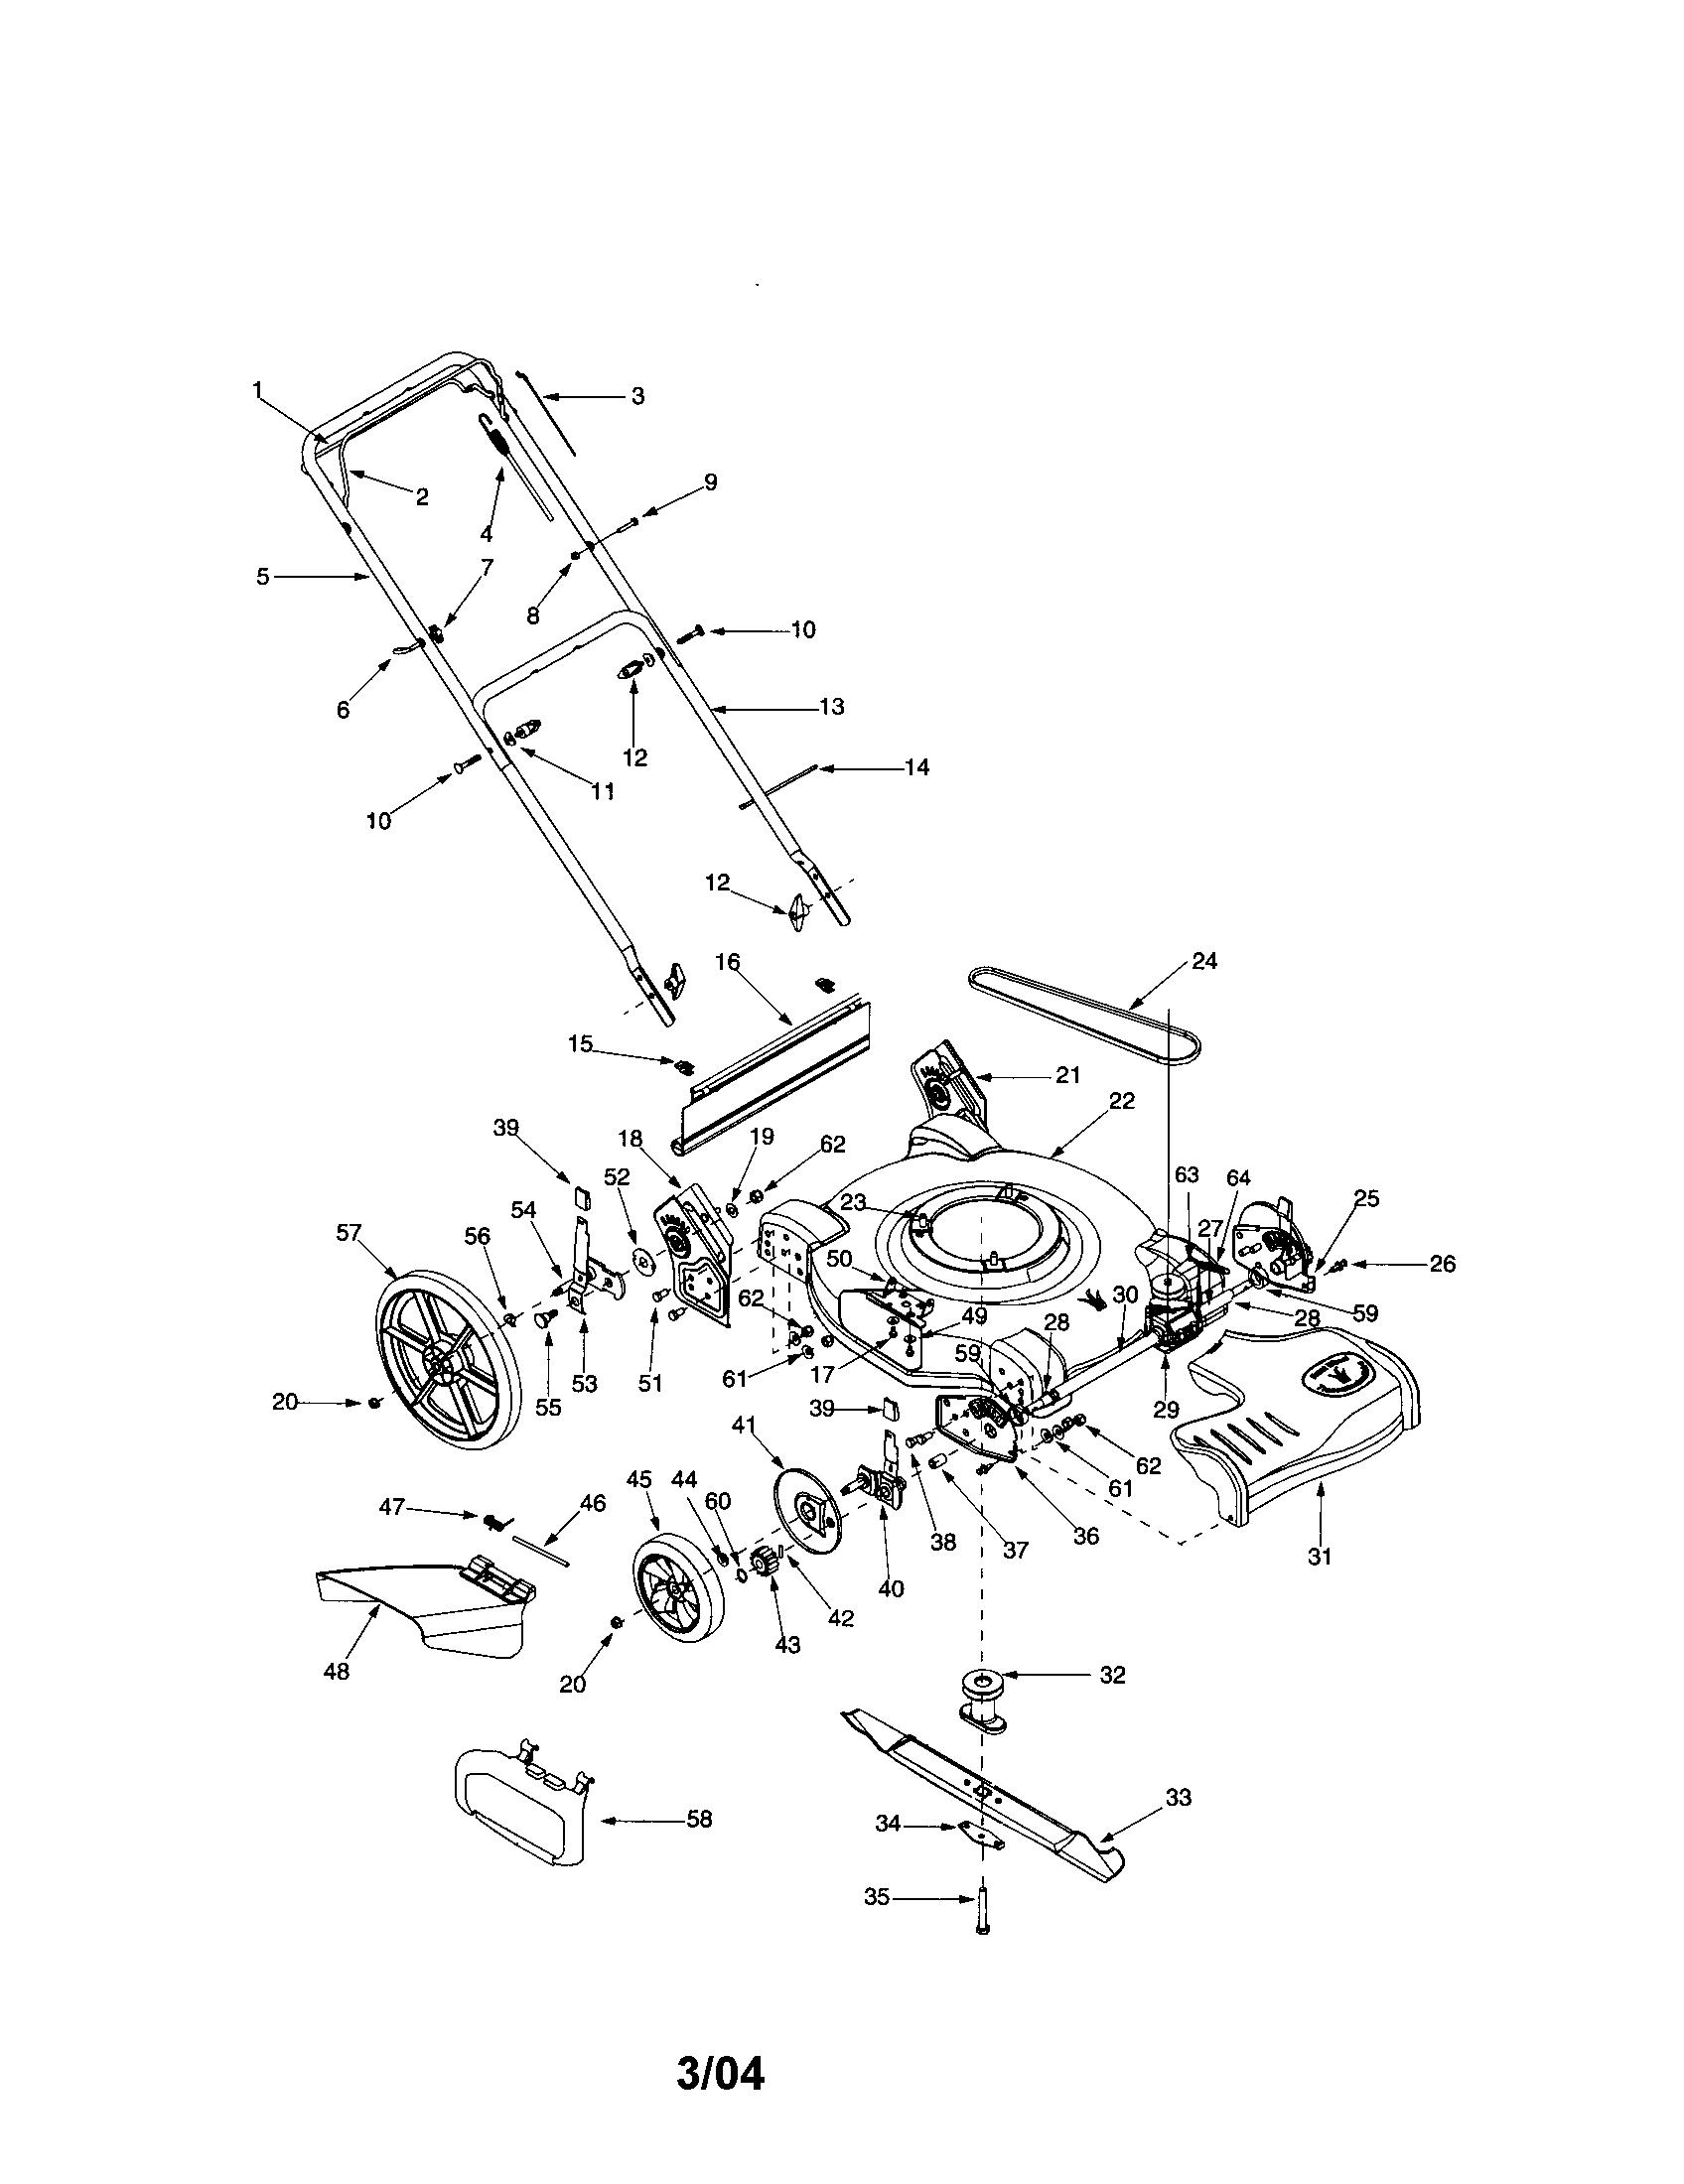 bolens lawn mower parts diagram model 13am762f765 Craftsman Lawn Mower 917 Manual